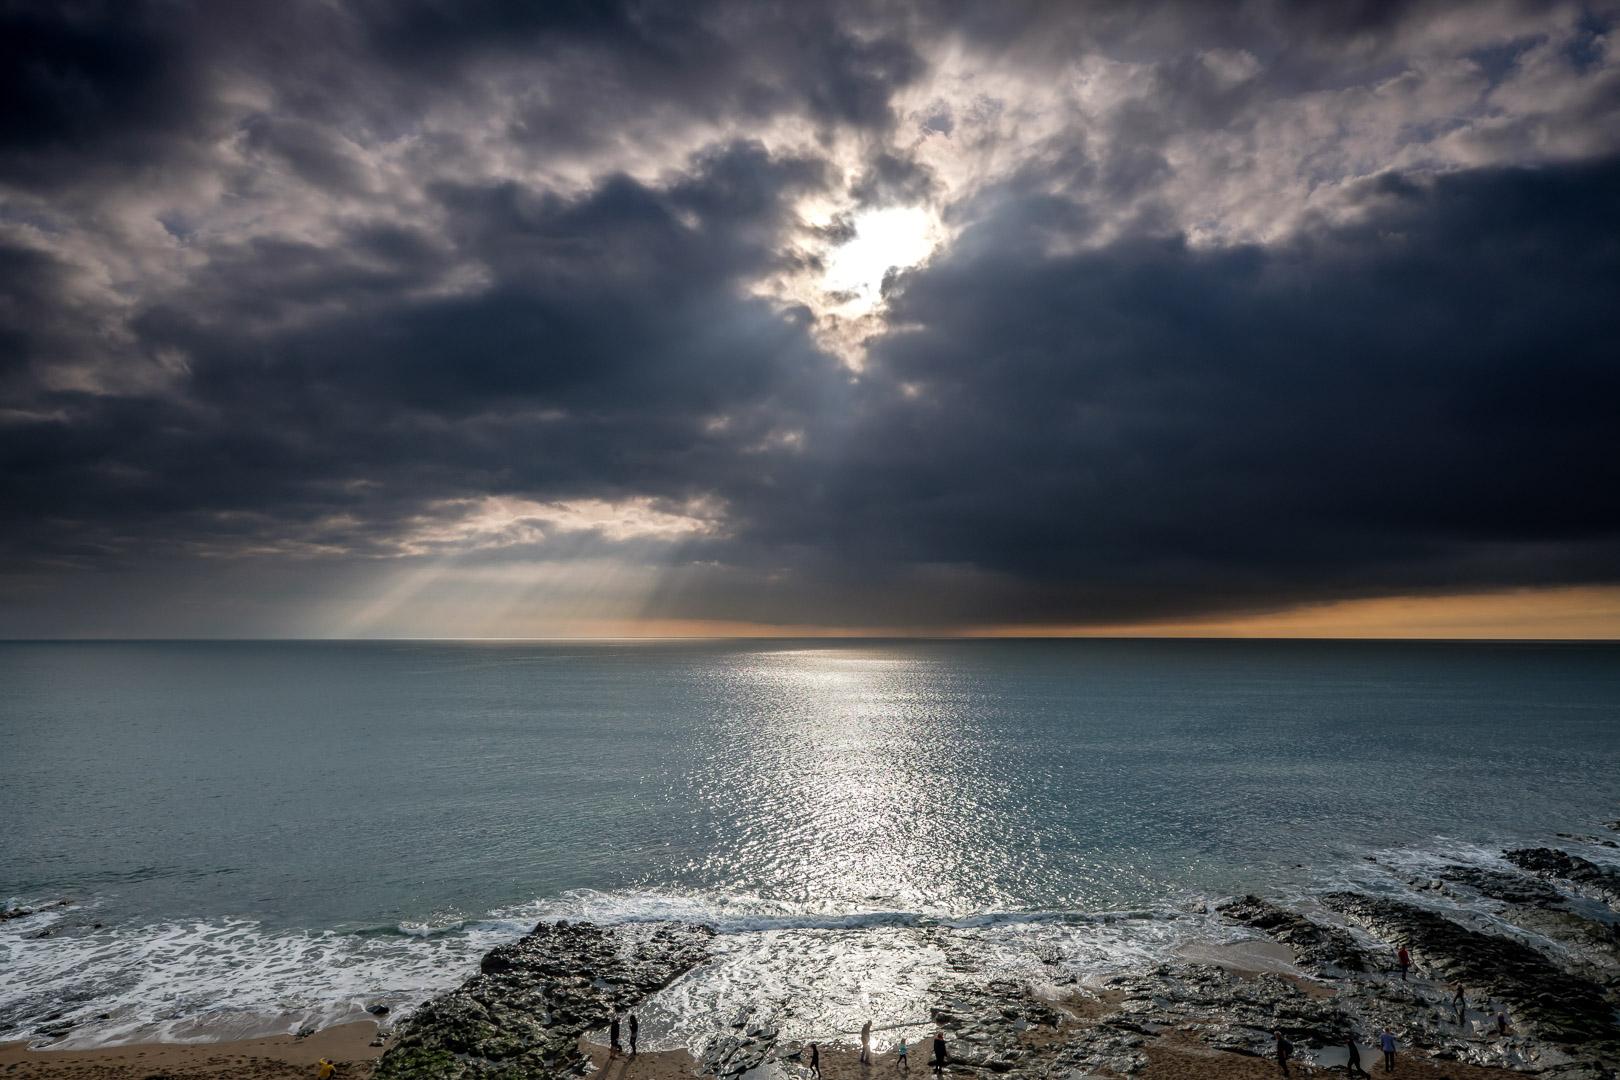 27.10.2017 - Mount's Bay